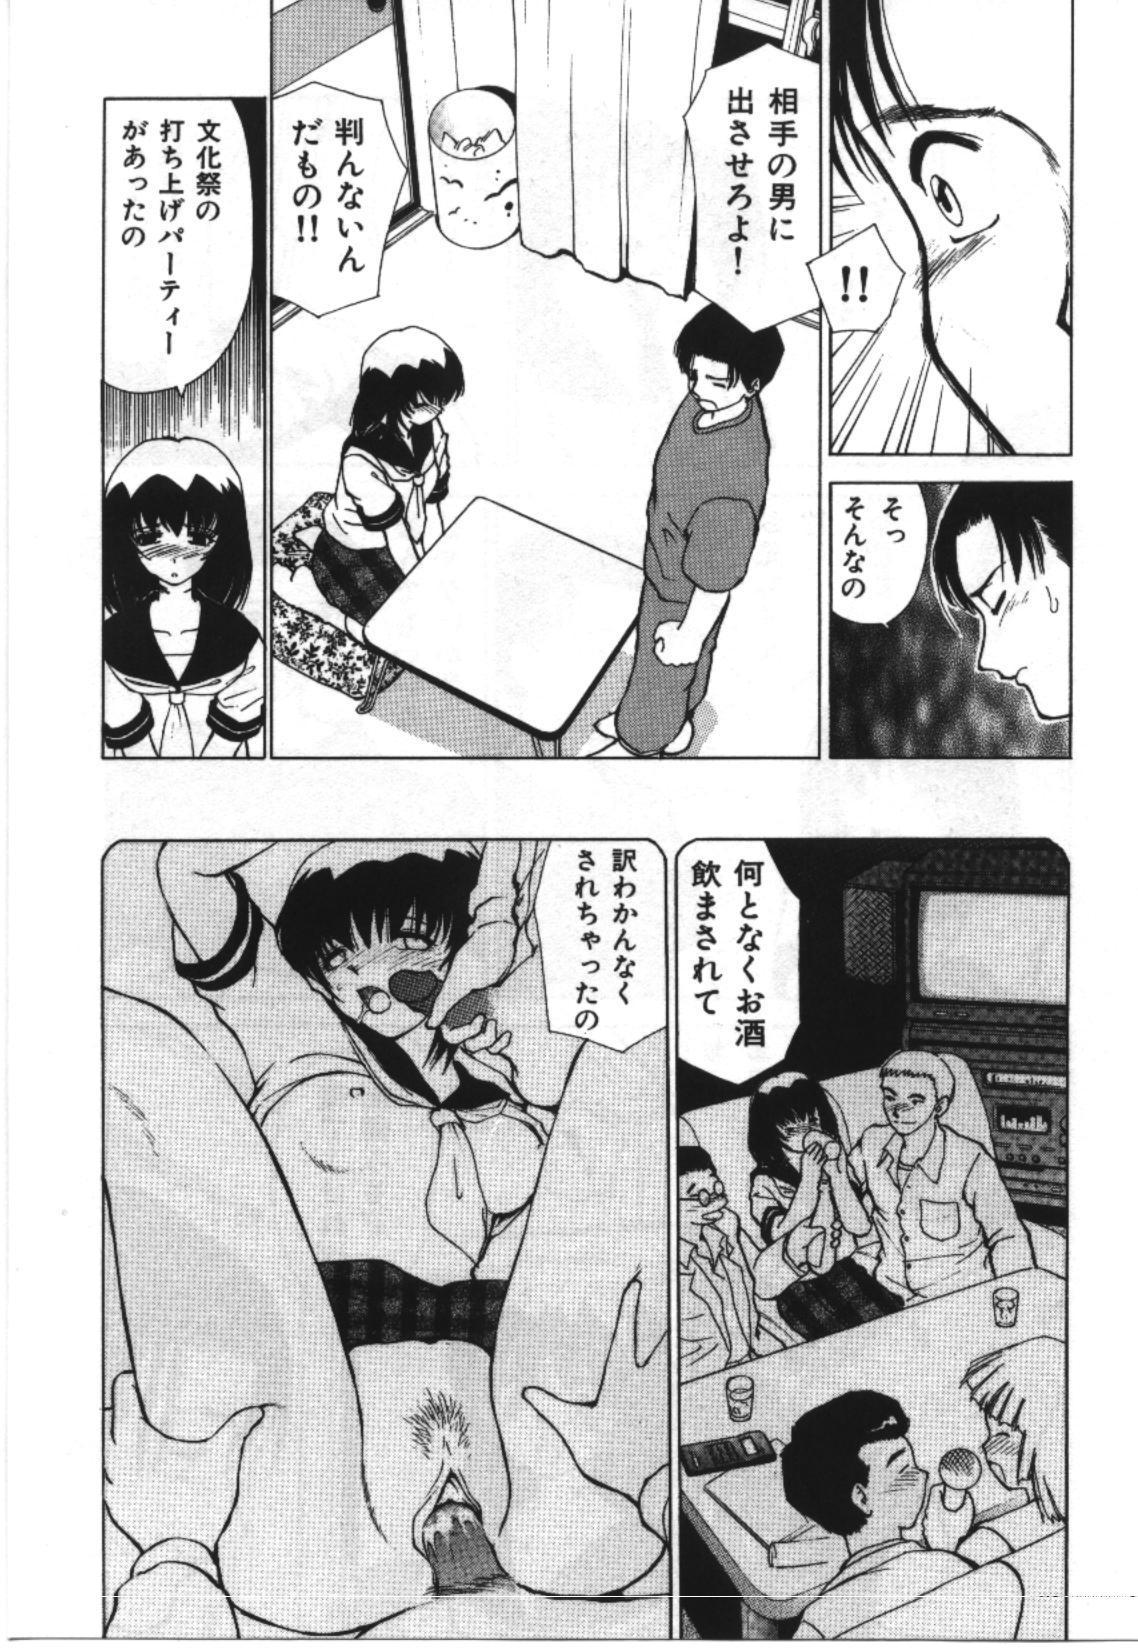 Imouto Koishi 2 106